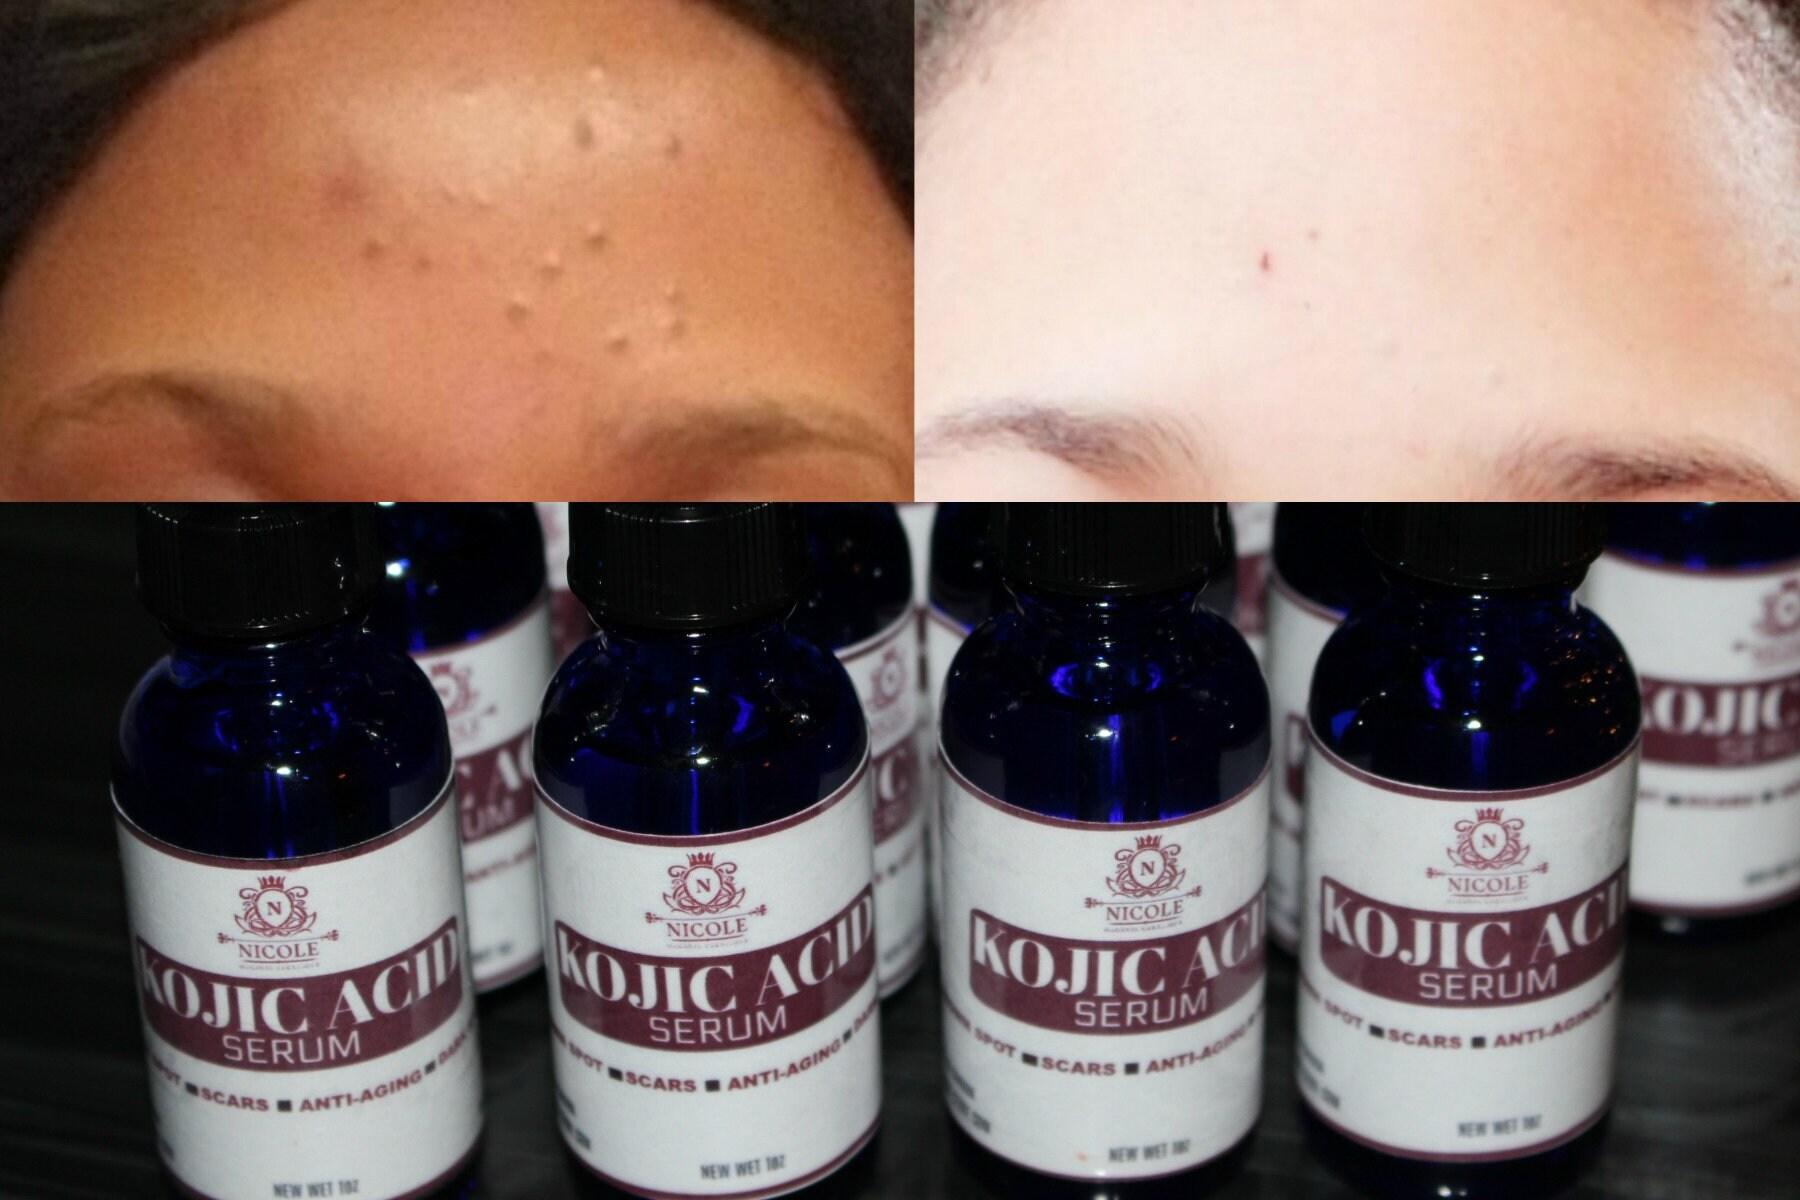 Kojic Acid Serum, dark spots, brown spots ...